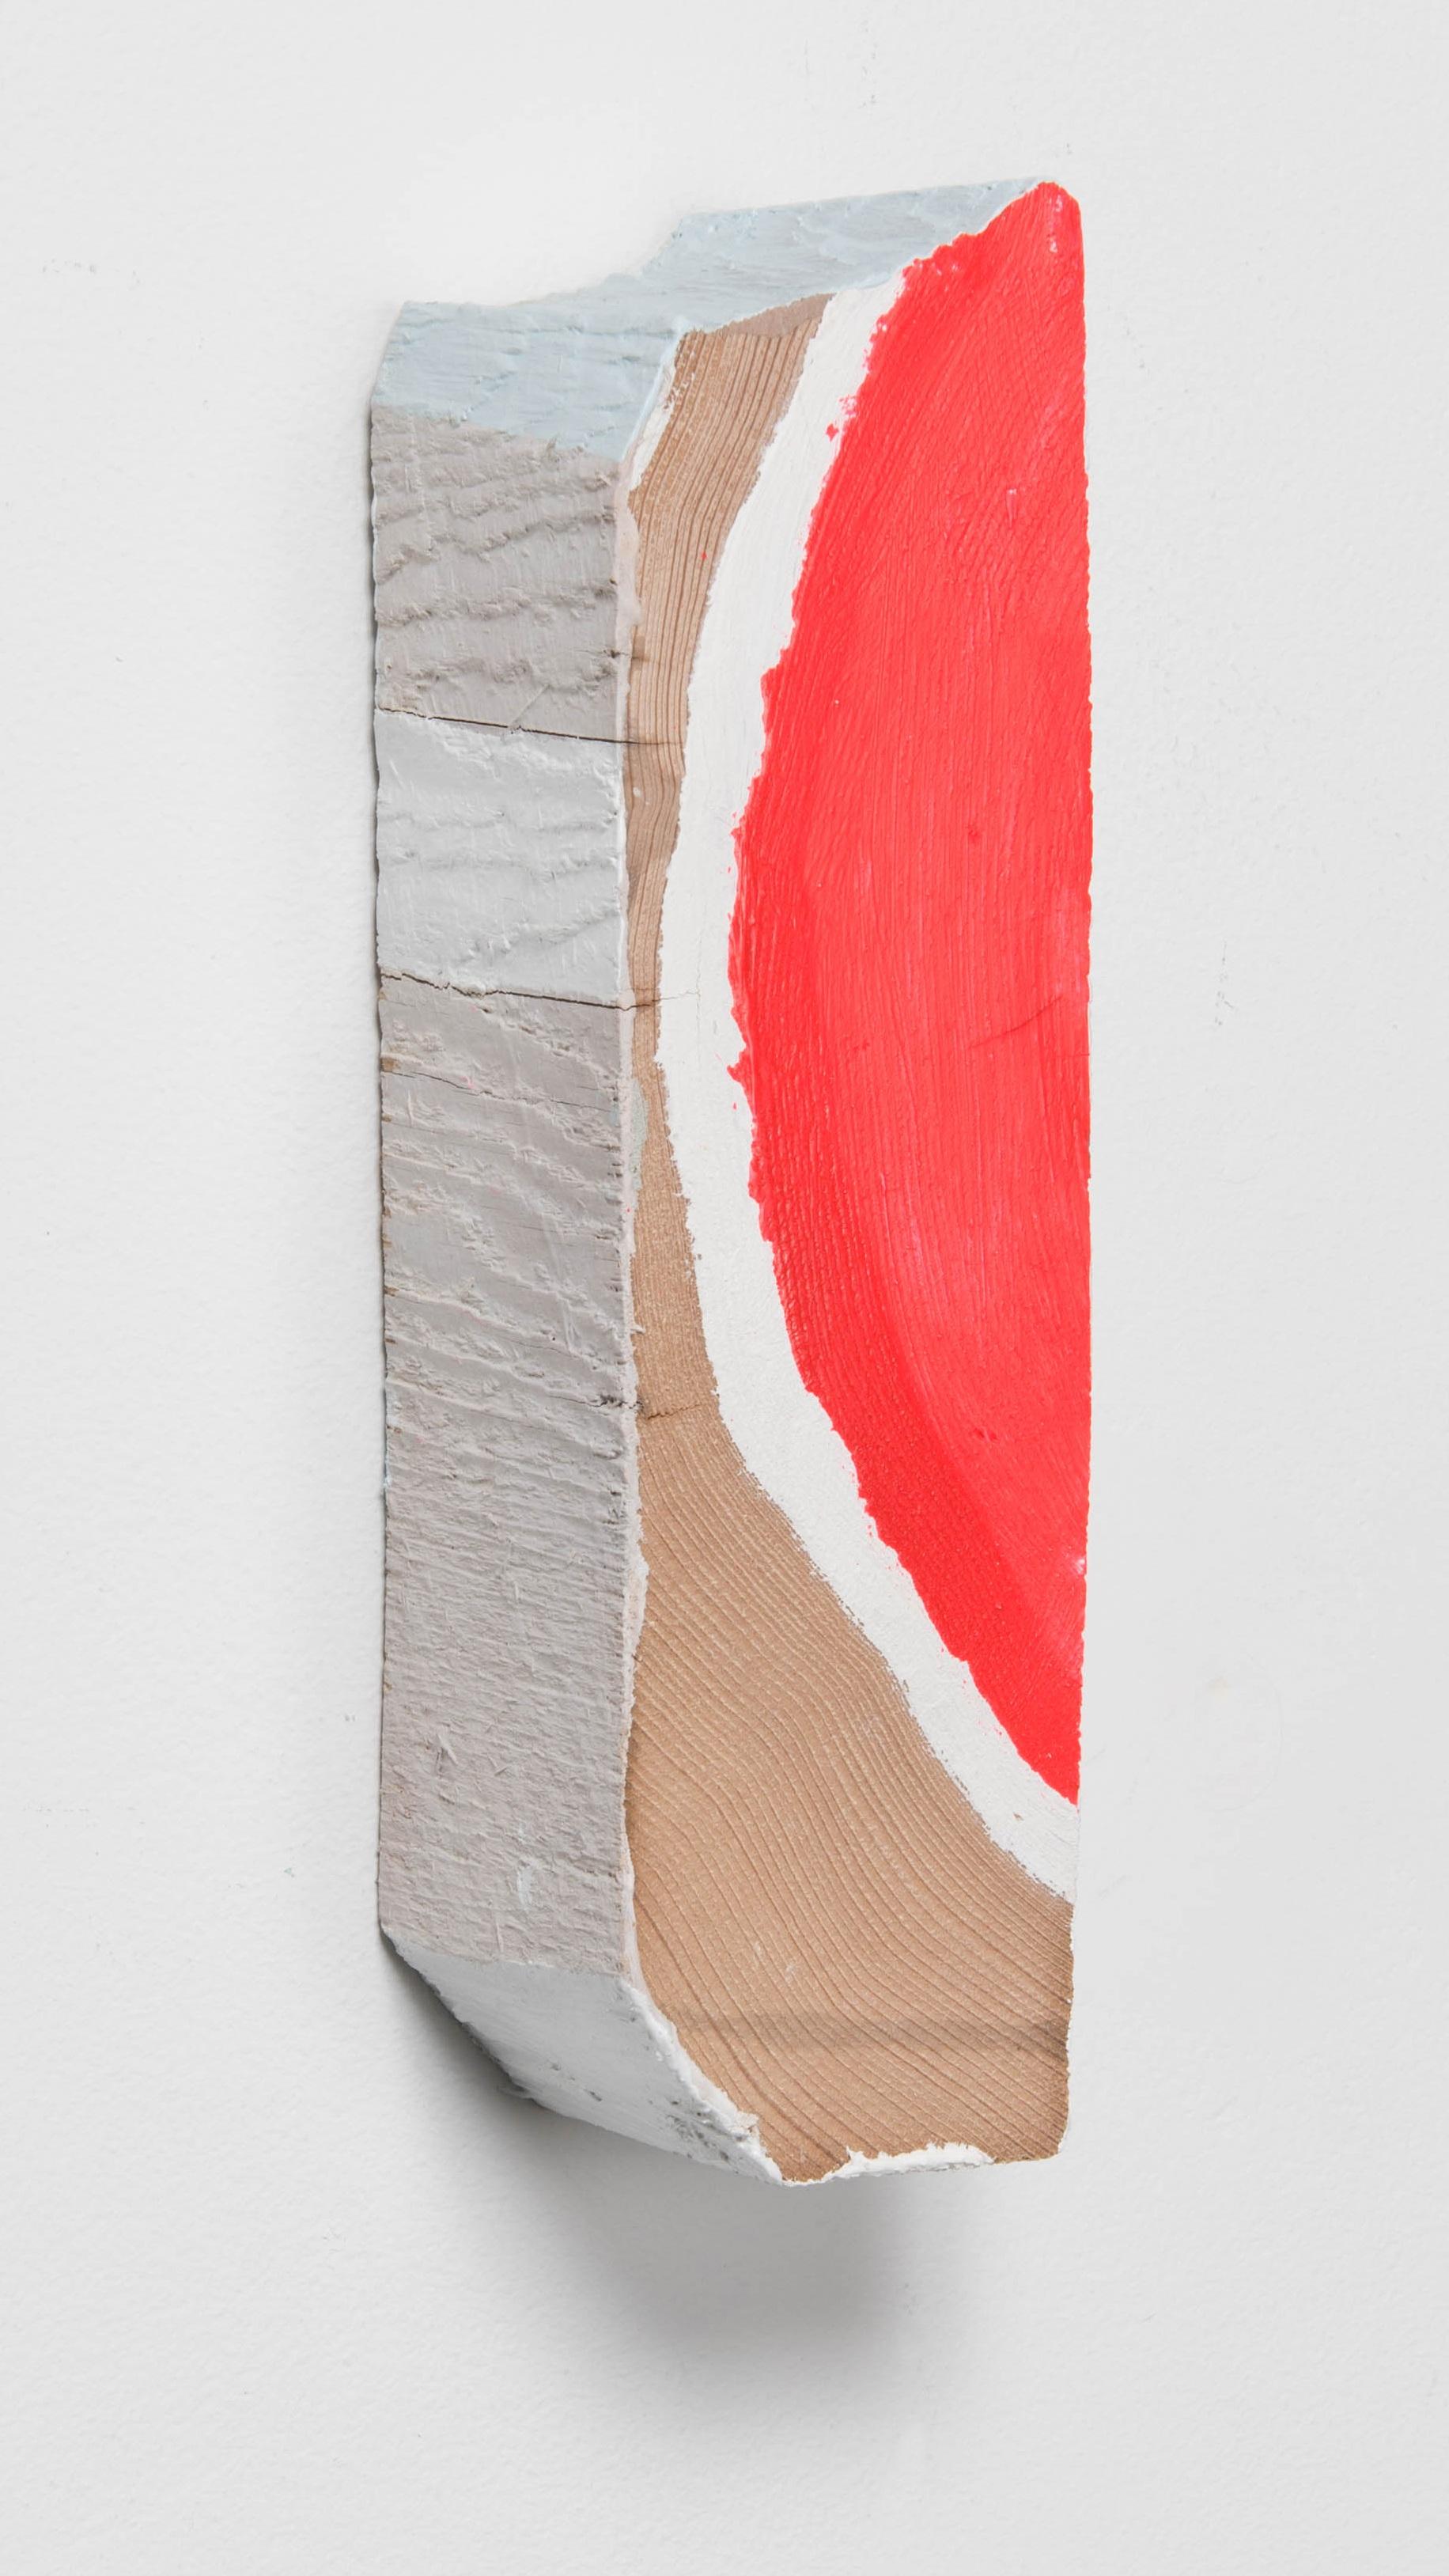 Slice Left , 2018  Acrylic and enamel on wood  9 x 2 1/2 x 2 1/2 inches